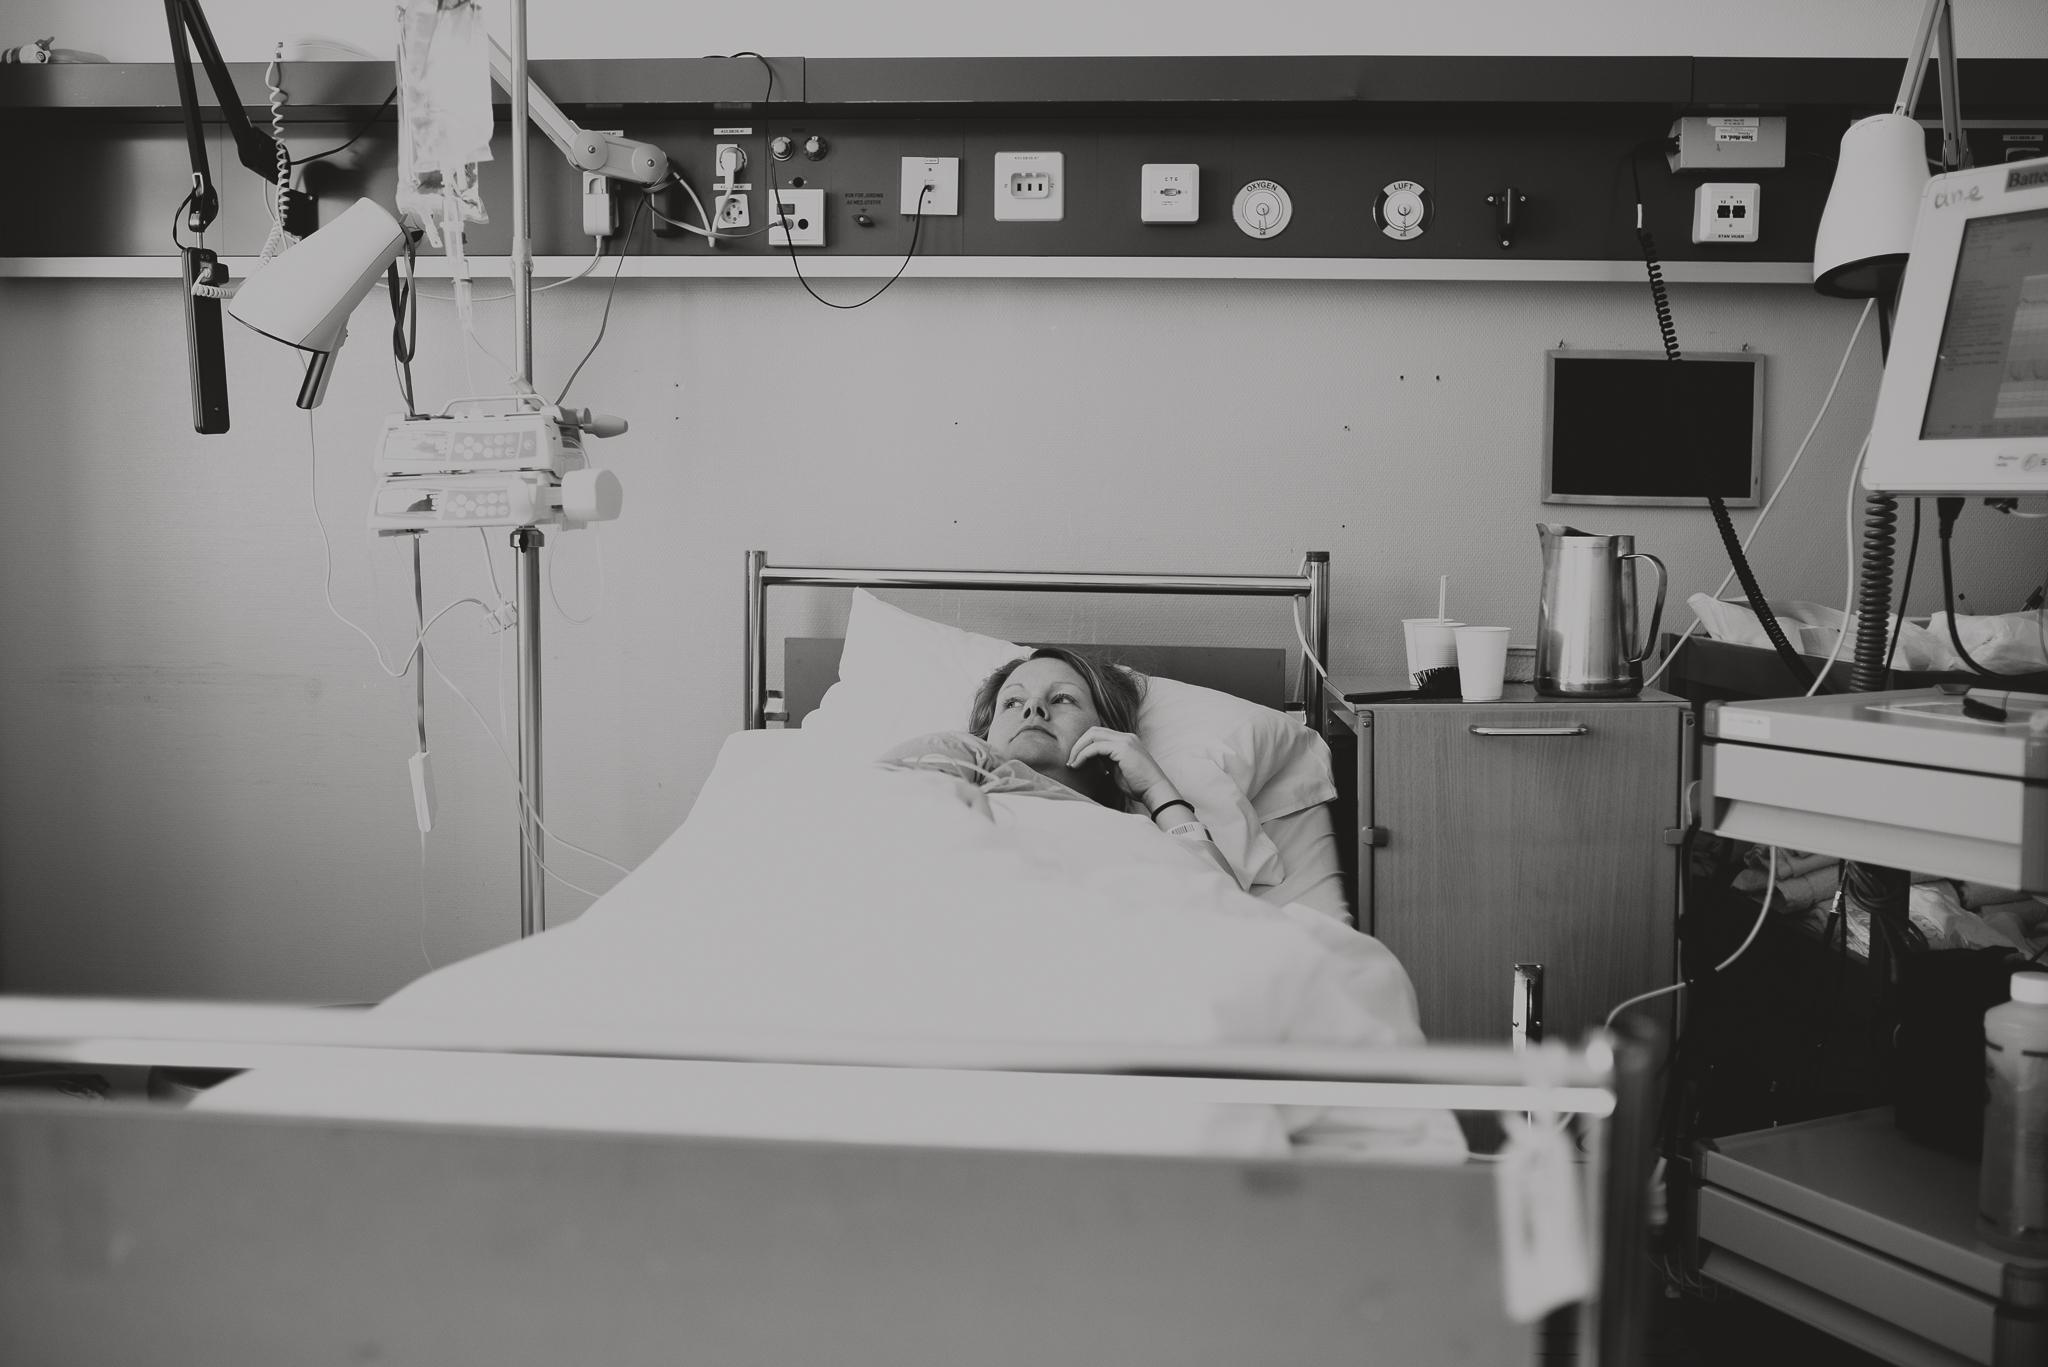 nyfødtfotografering-fødselsfotografering-babyfotografering-maria-vatne-kongsberg-oslo-37.jpg